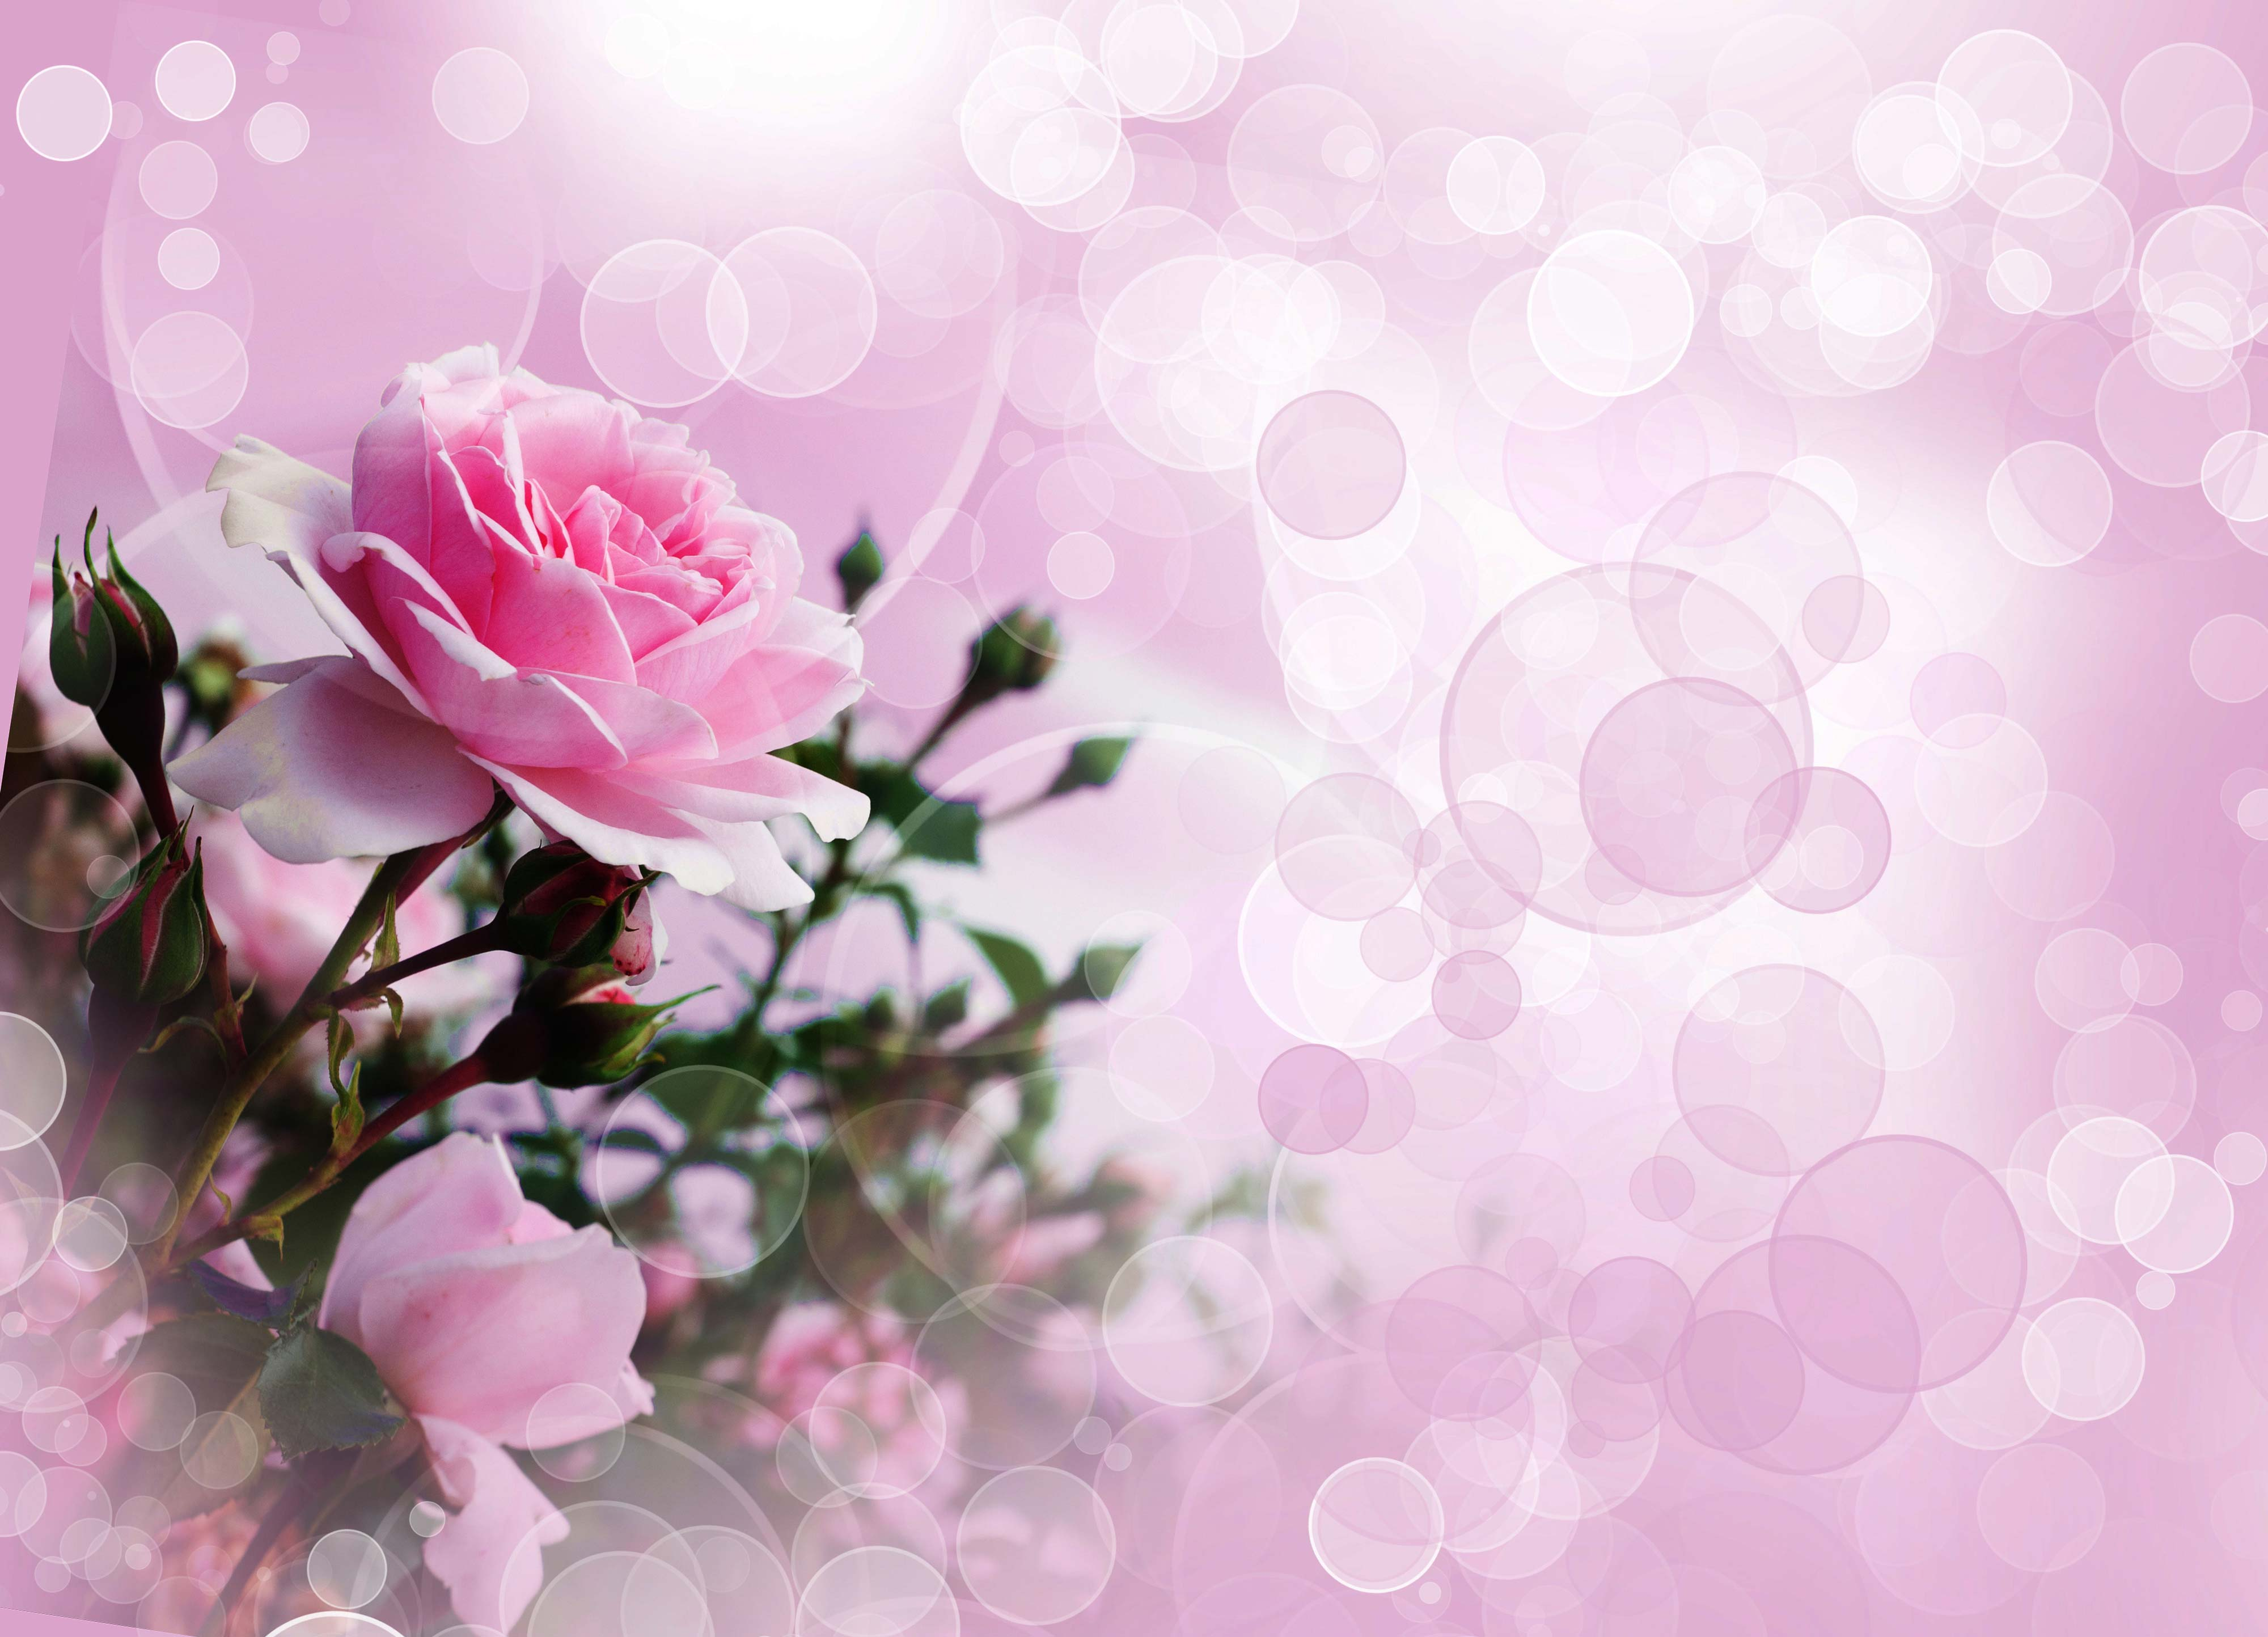 Pink Rose 4k Ultra Hd Wallpaper Hintergrund 4000x2887